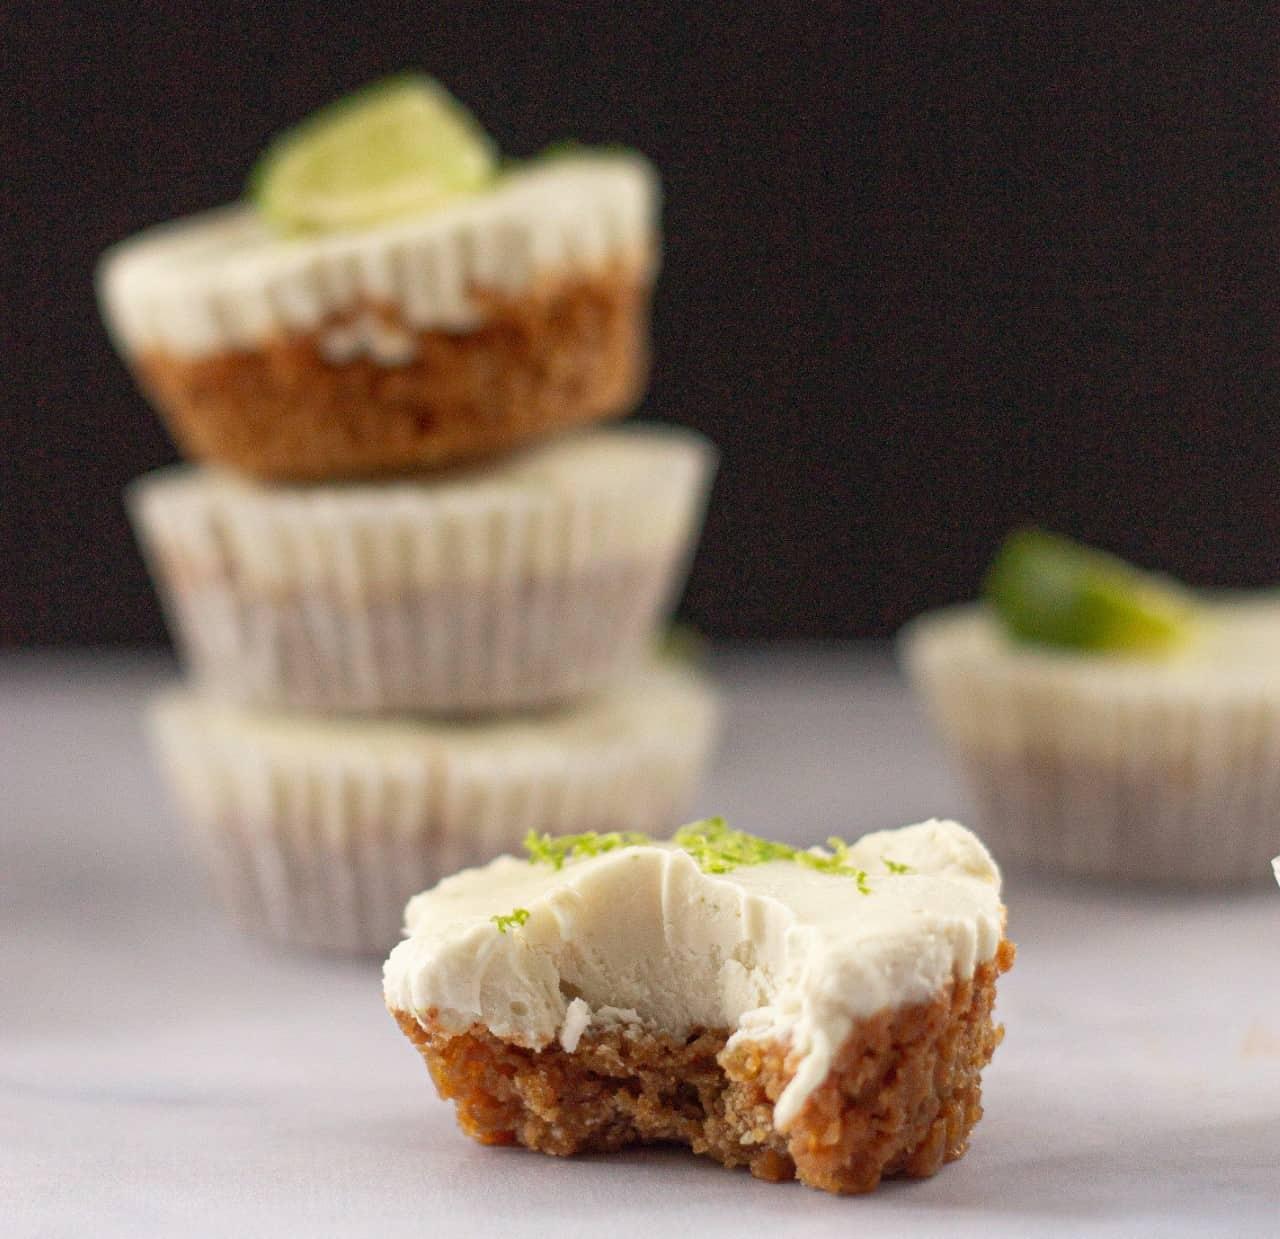 No Bake Vegan Key Lime Pie is the Perfect Refreshing Dessert